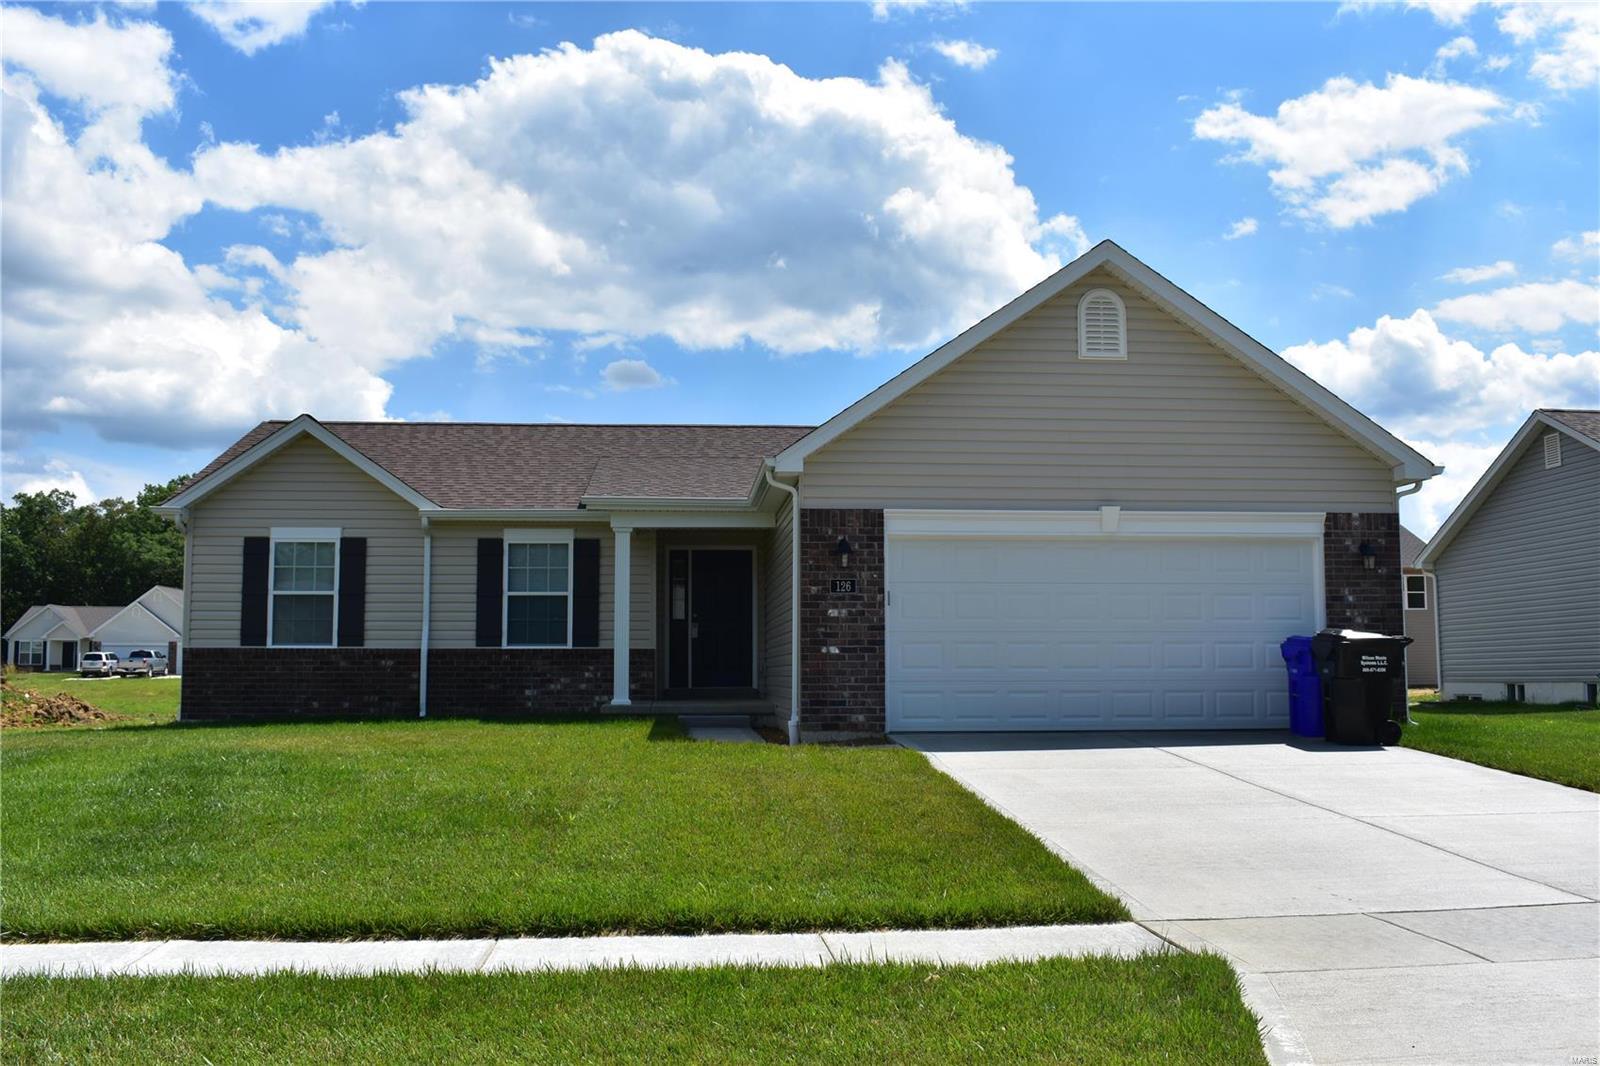 101 TBB-Lot 1 Bryan Ridge Property Photo - Wright City, MO real estate listing